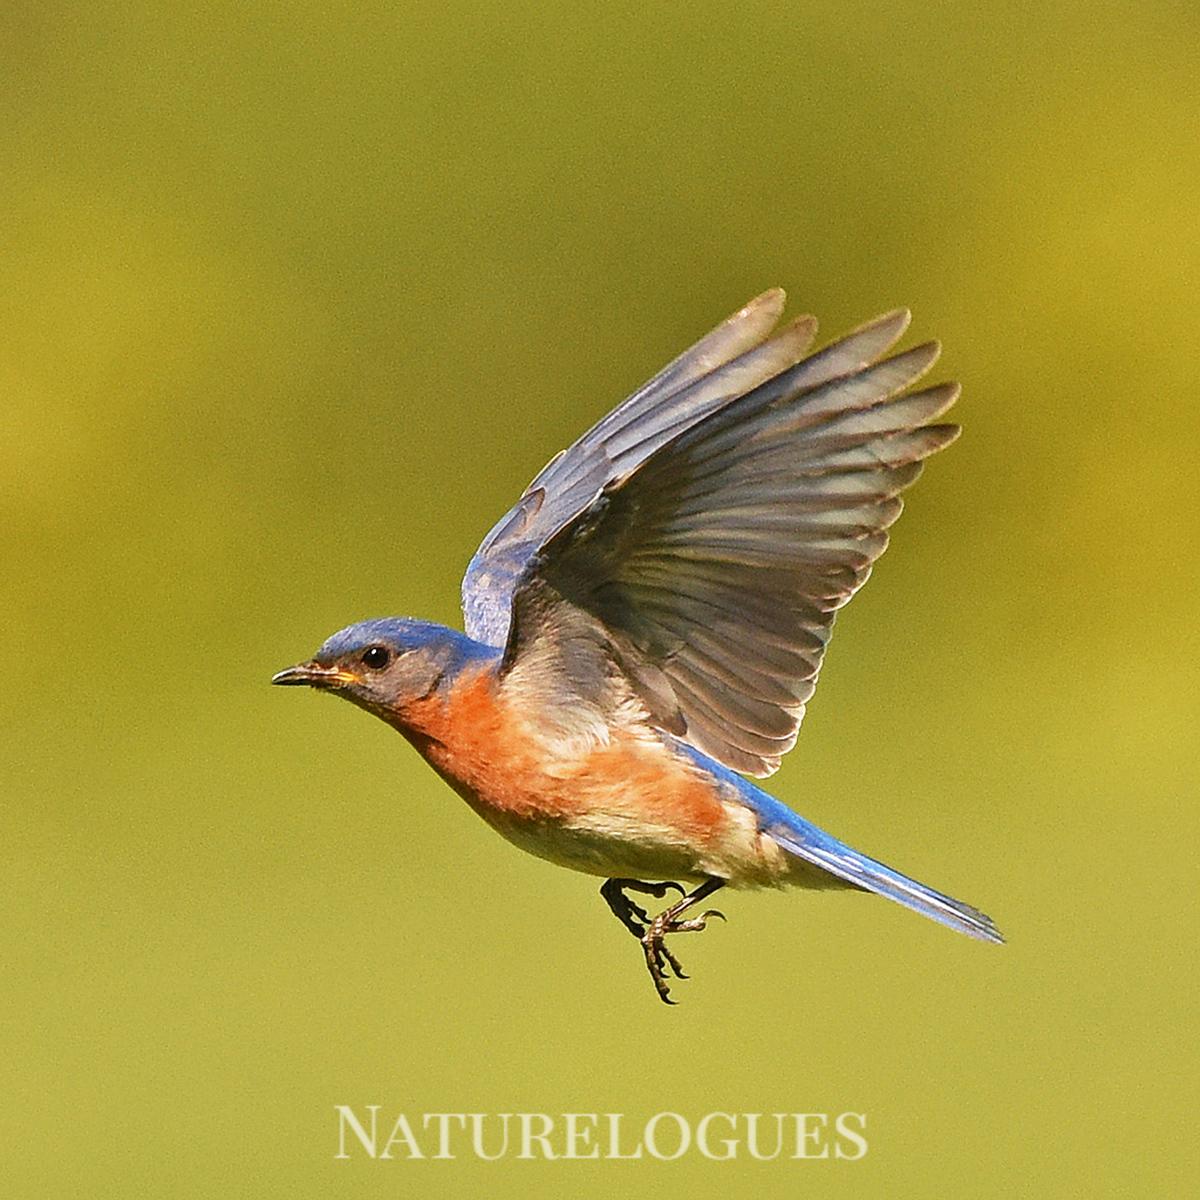 Flying Bluebird